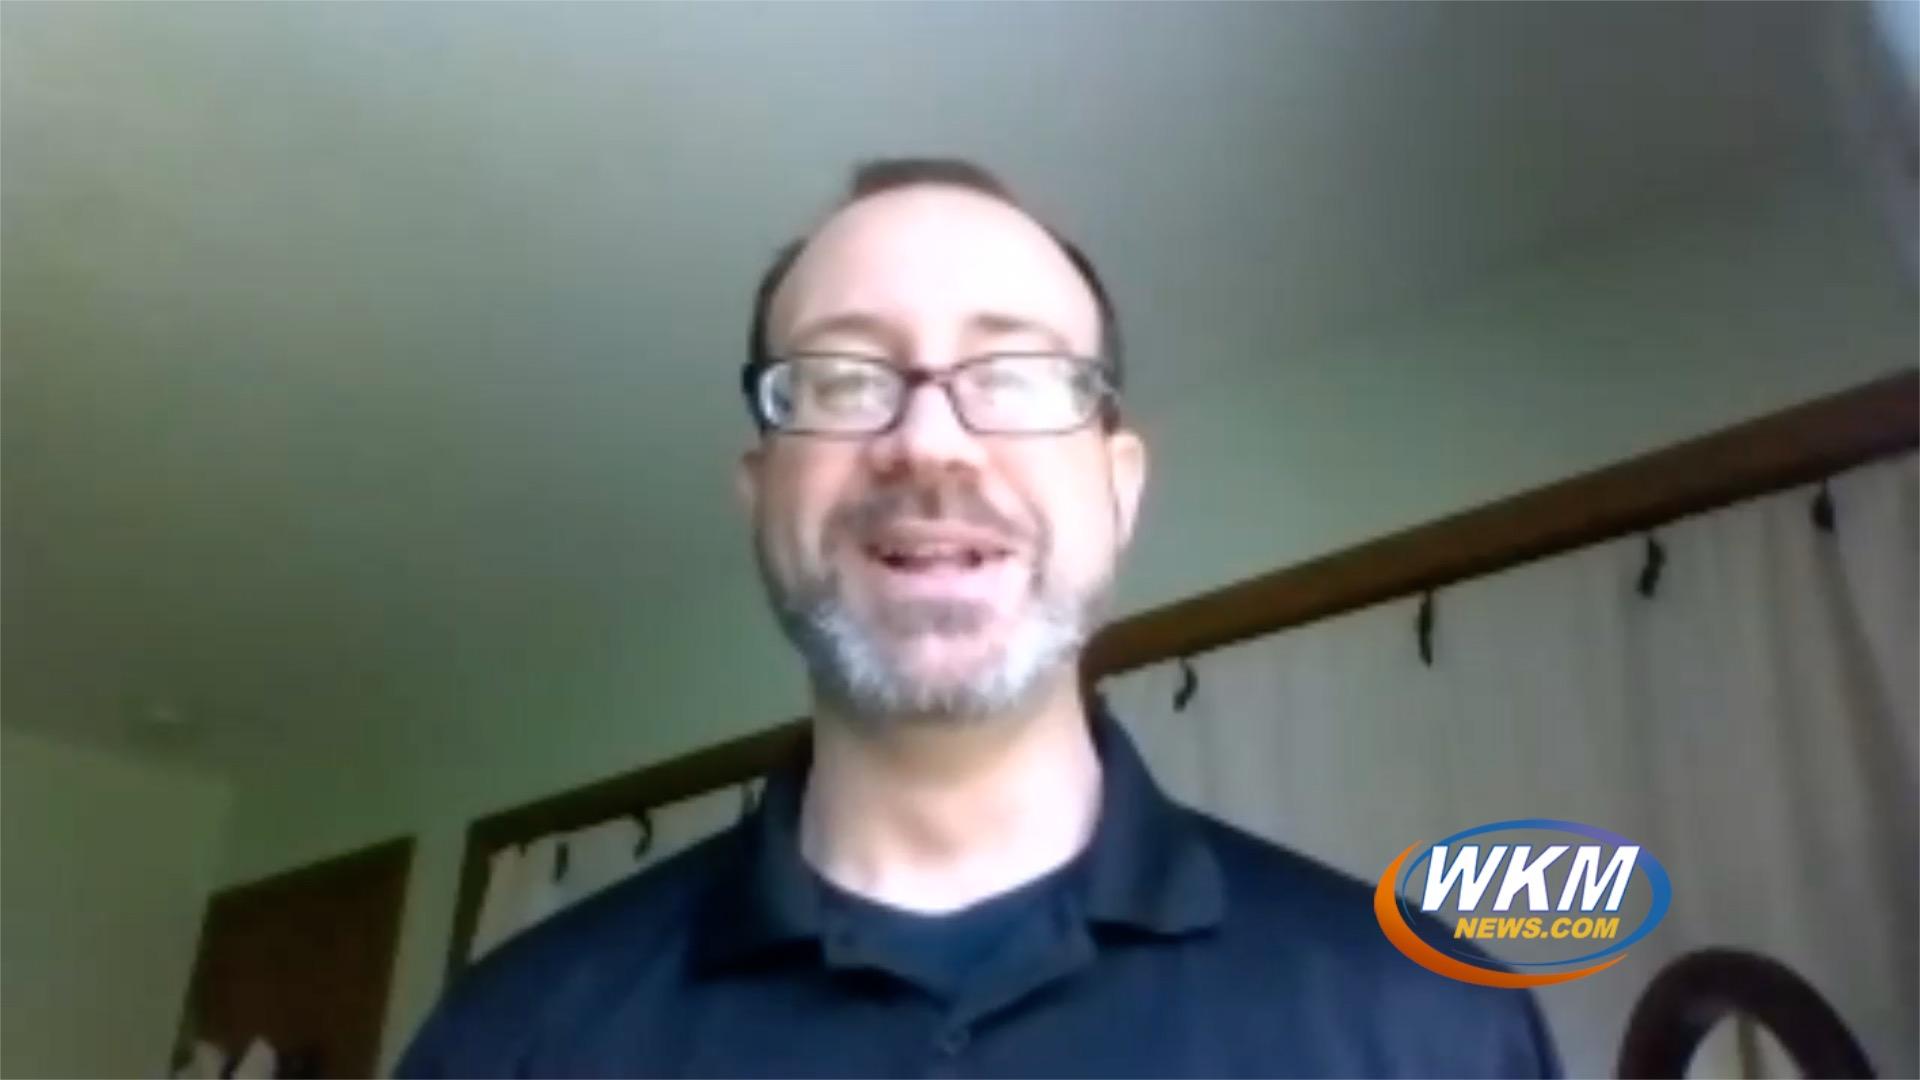 Educator Discusses Virtual Teaching During COVID-19 Outbreak